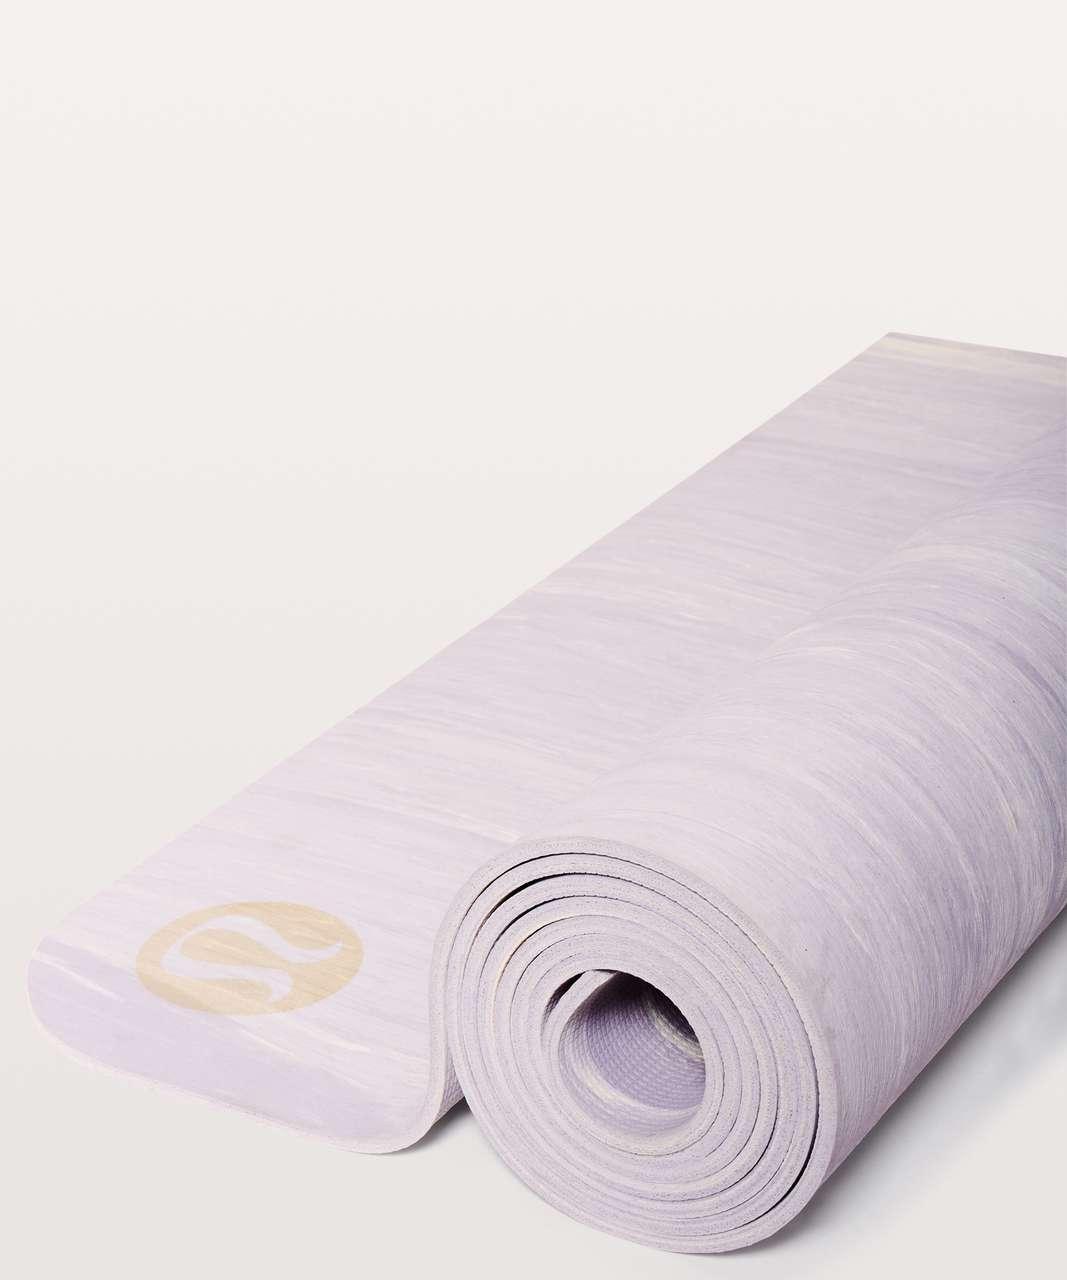 Lululemon Namastay Mat - Silver Lilac / White